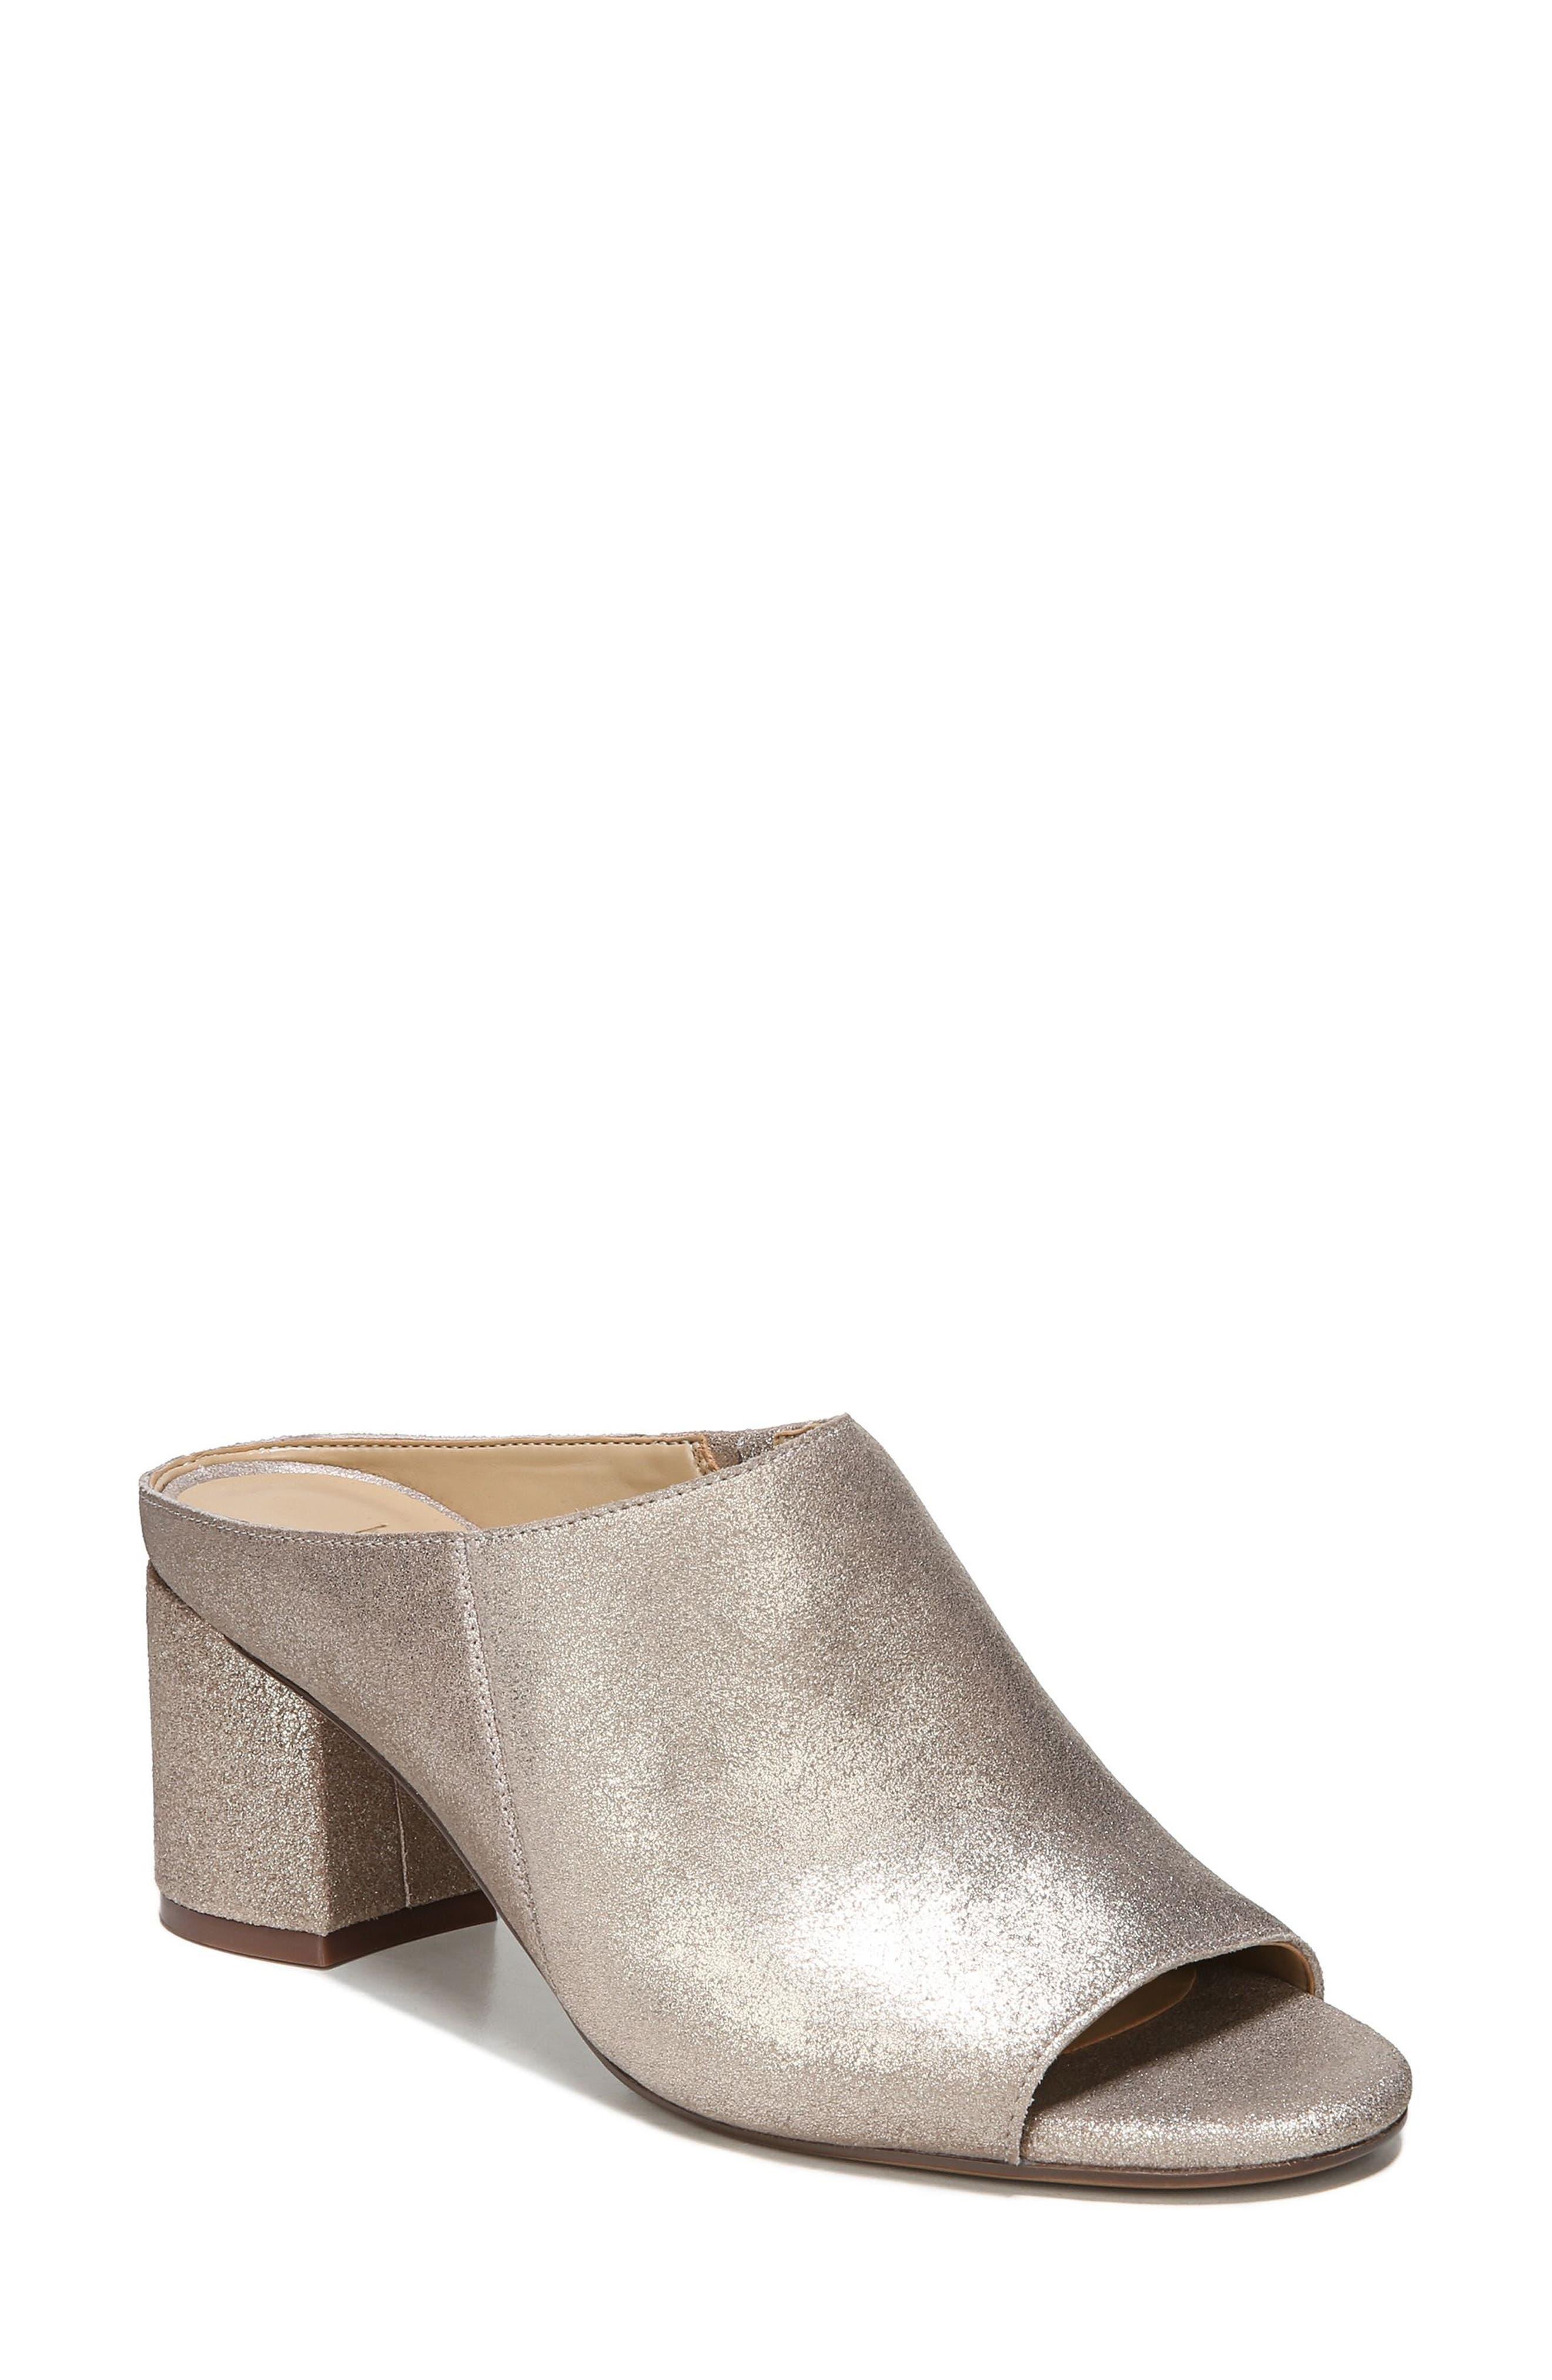 Cyprine Slide Sandal,                         Main,                         color, Champagne Suede